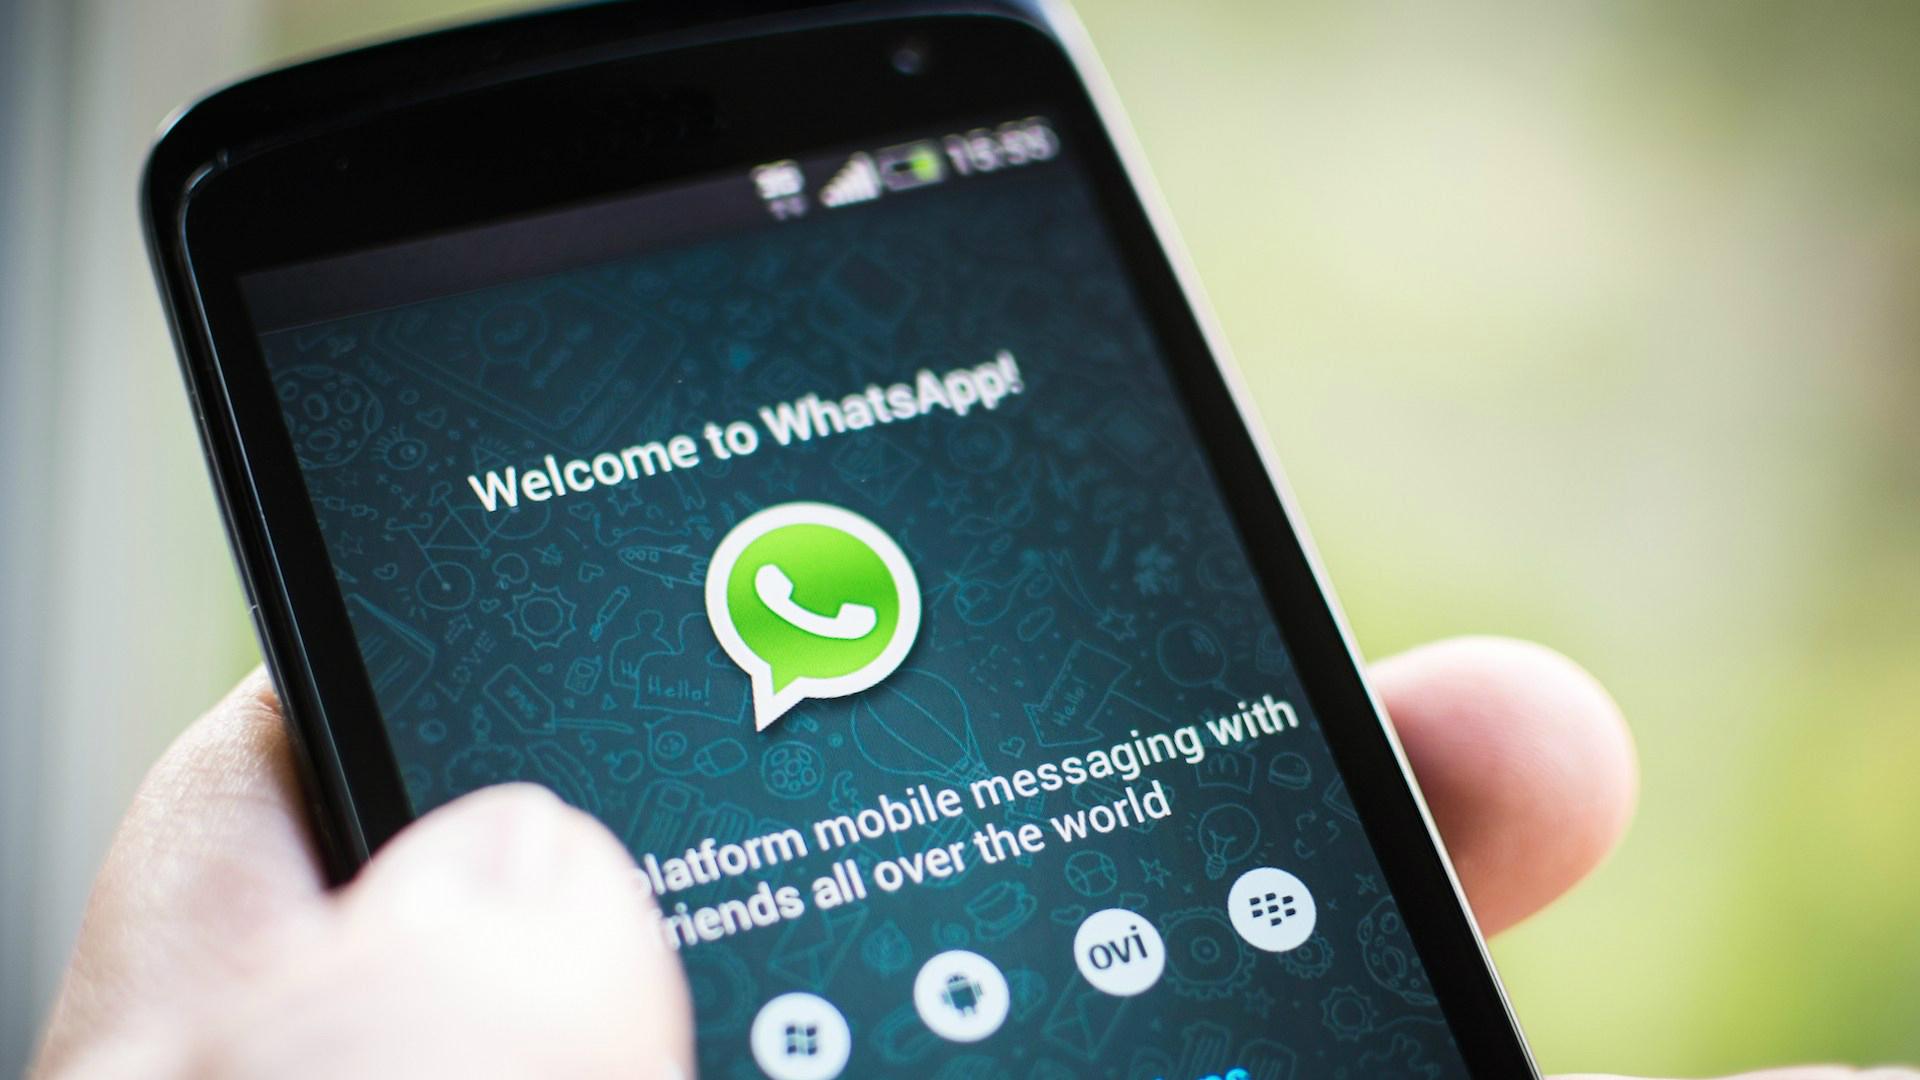 cele mai bune aplicații android whatsapp 11